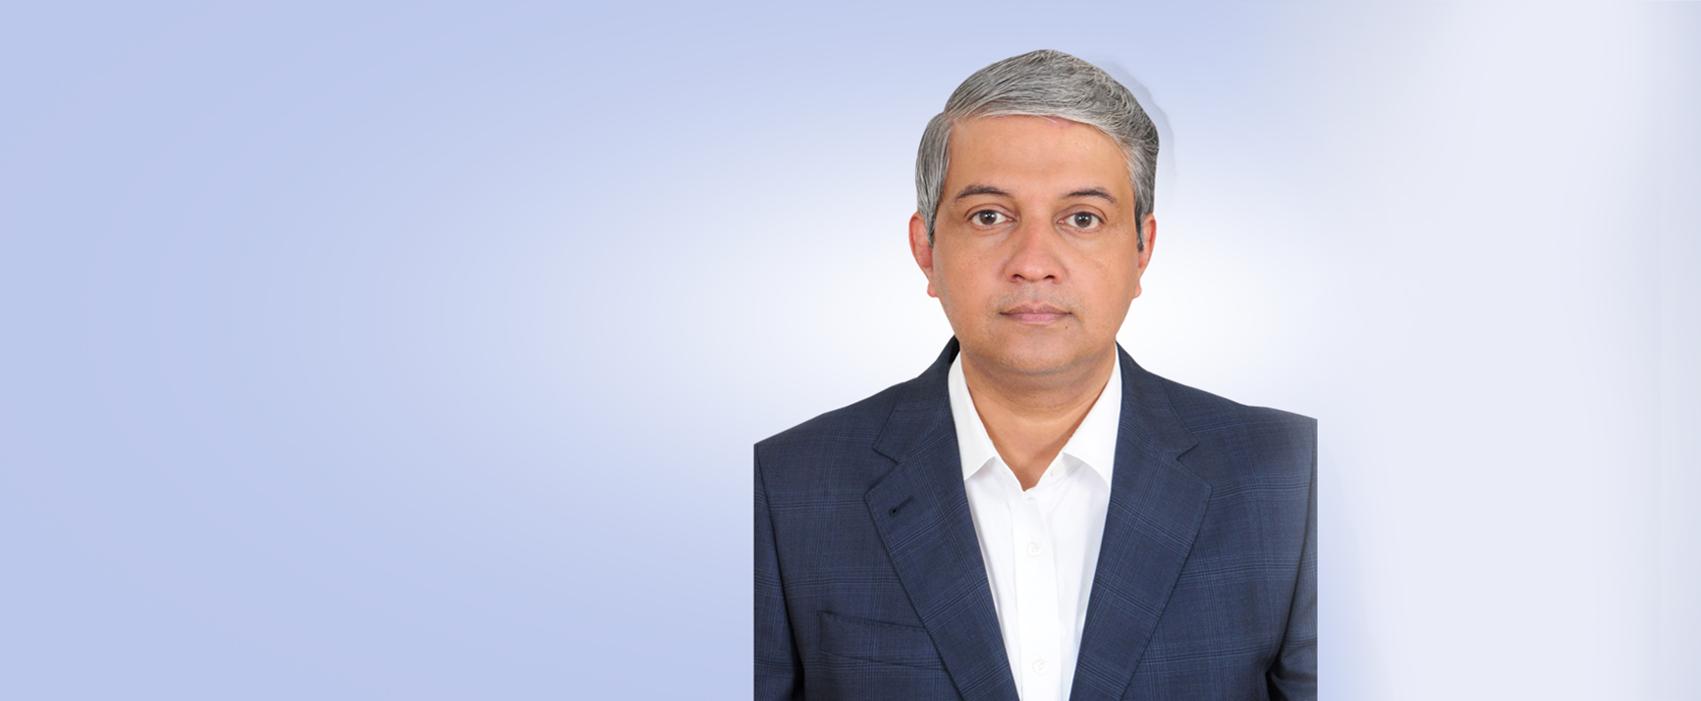 Mr. Anupam Dikshit